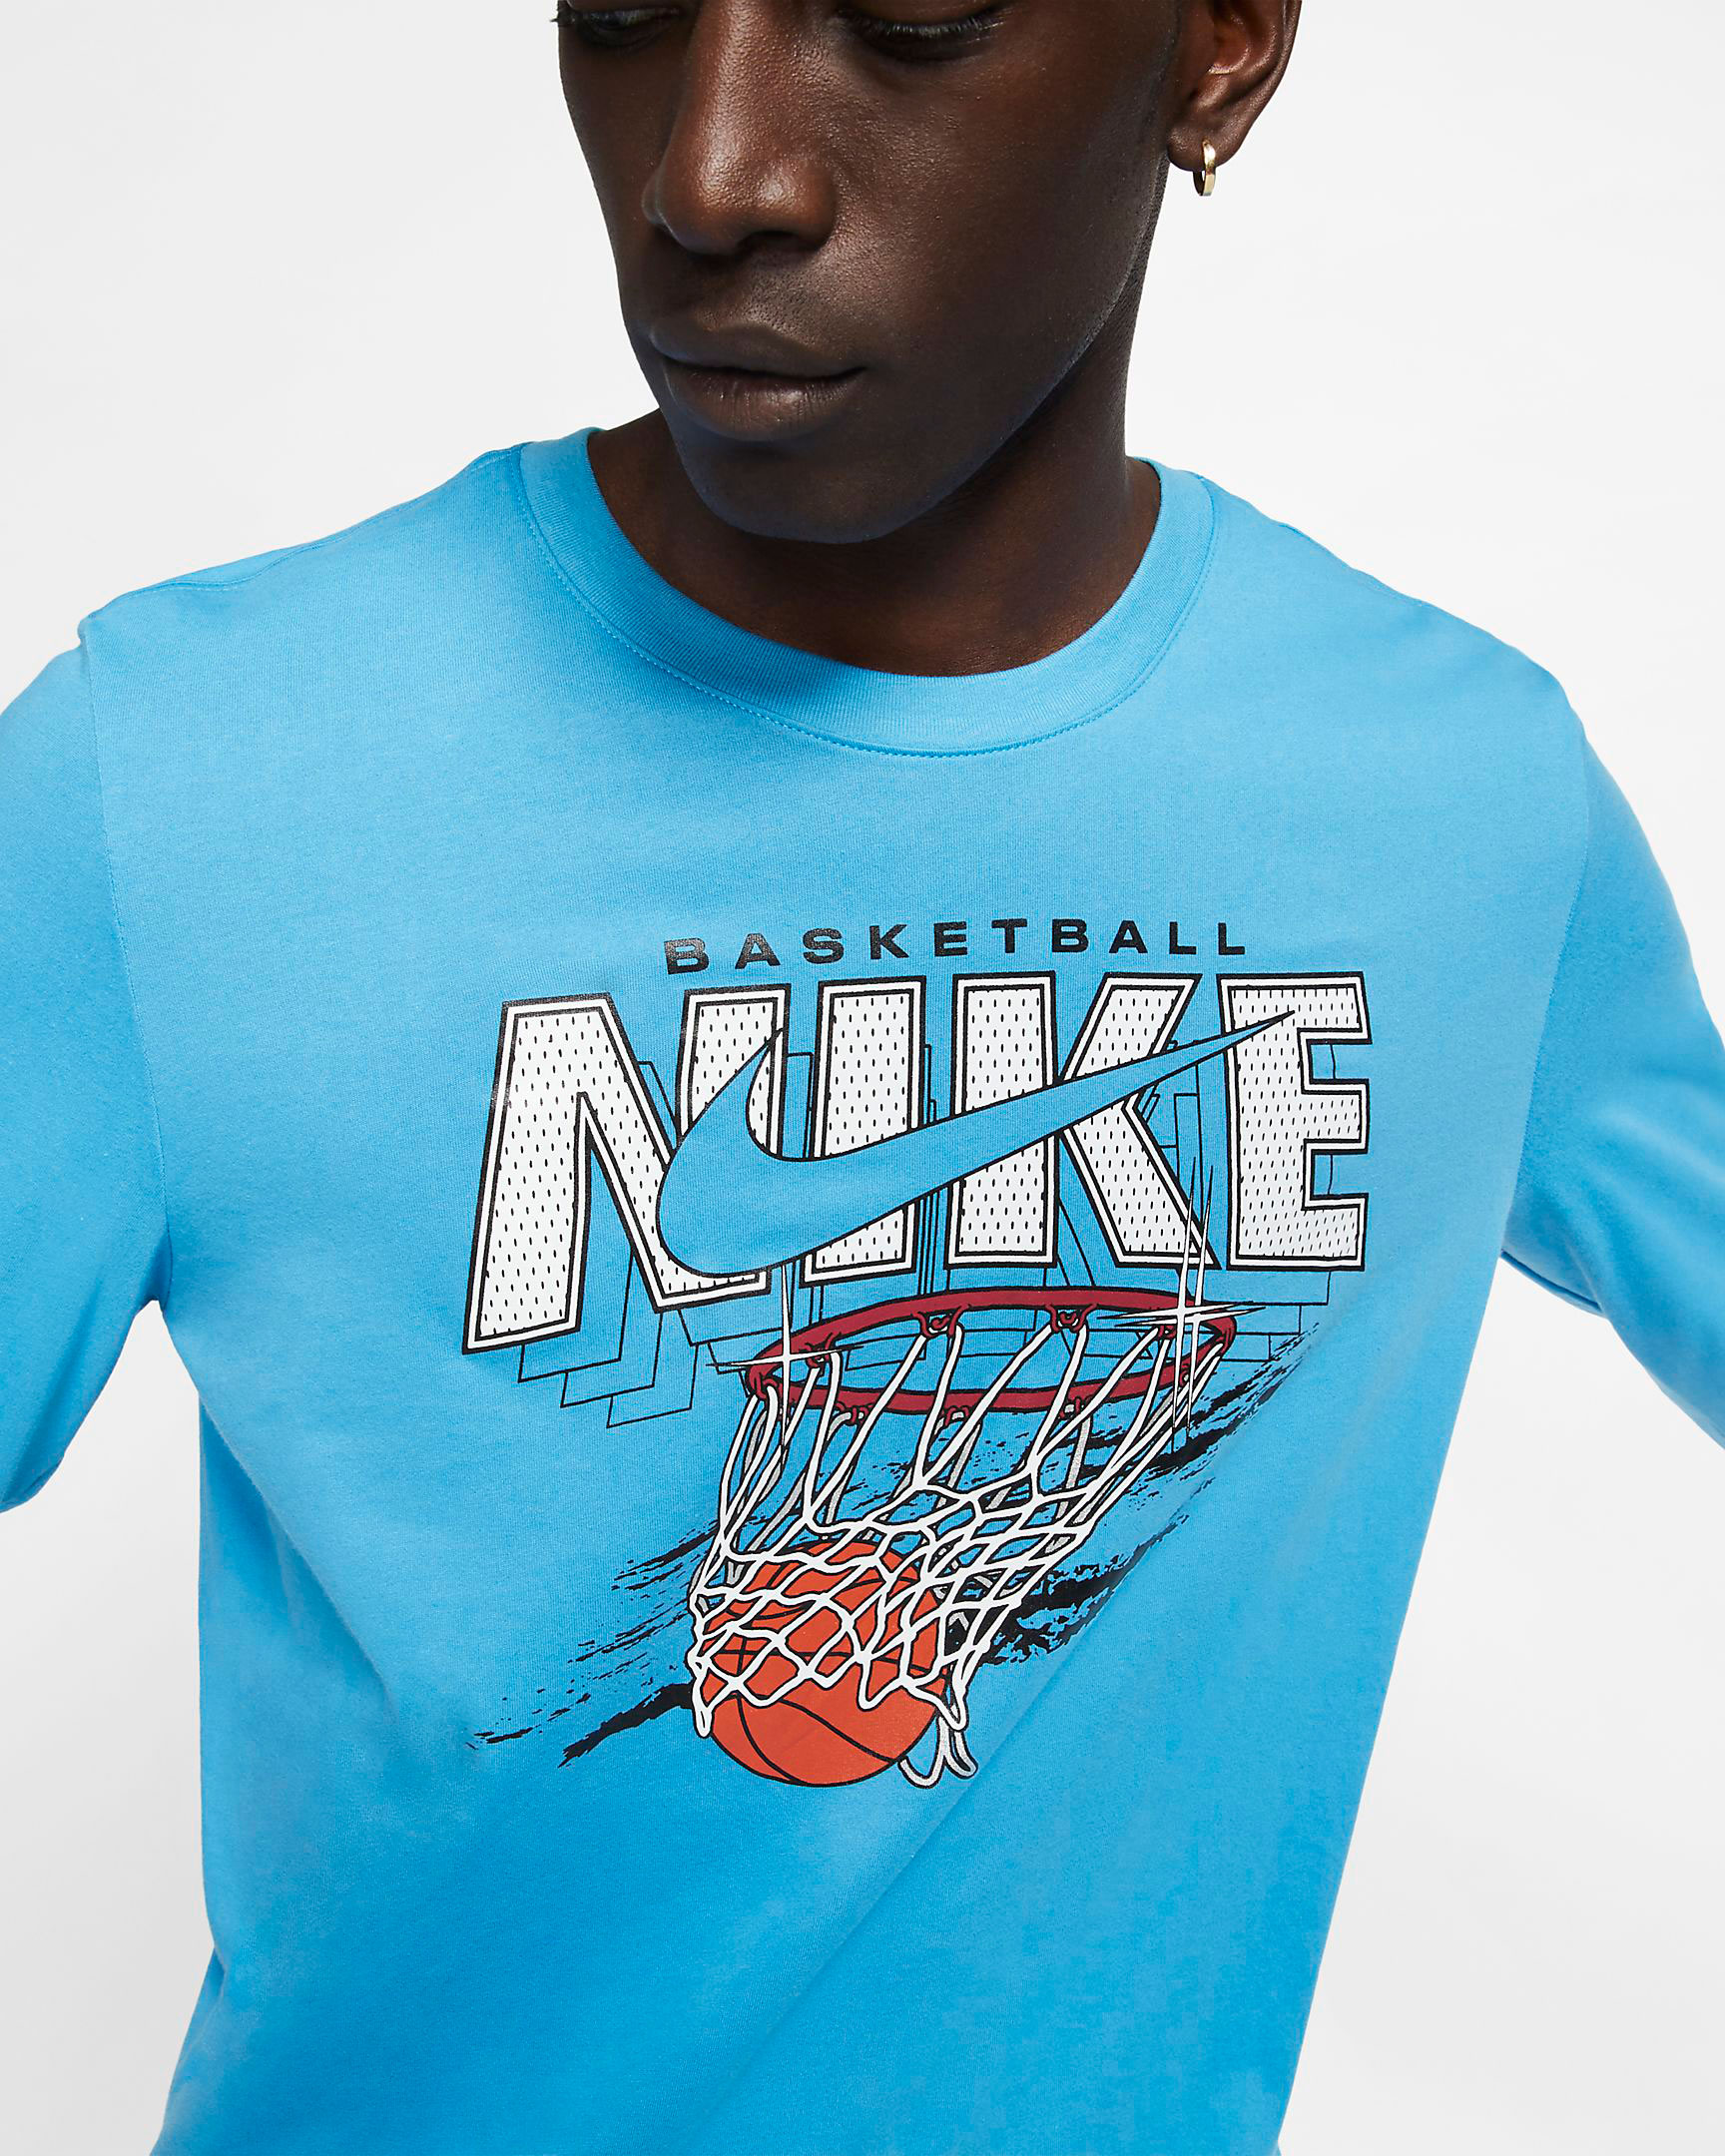 nike-basketball-swish-long-sleeve-shirt-blue